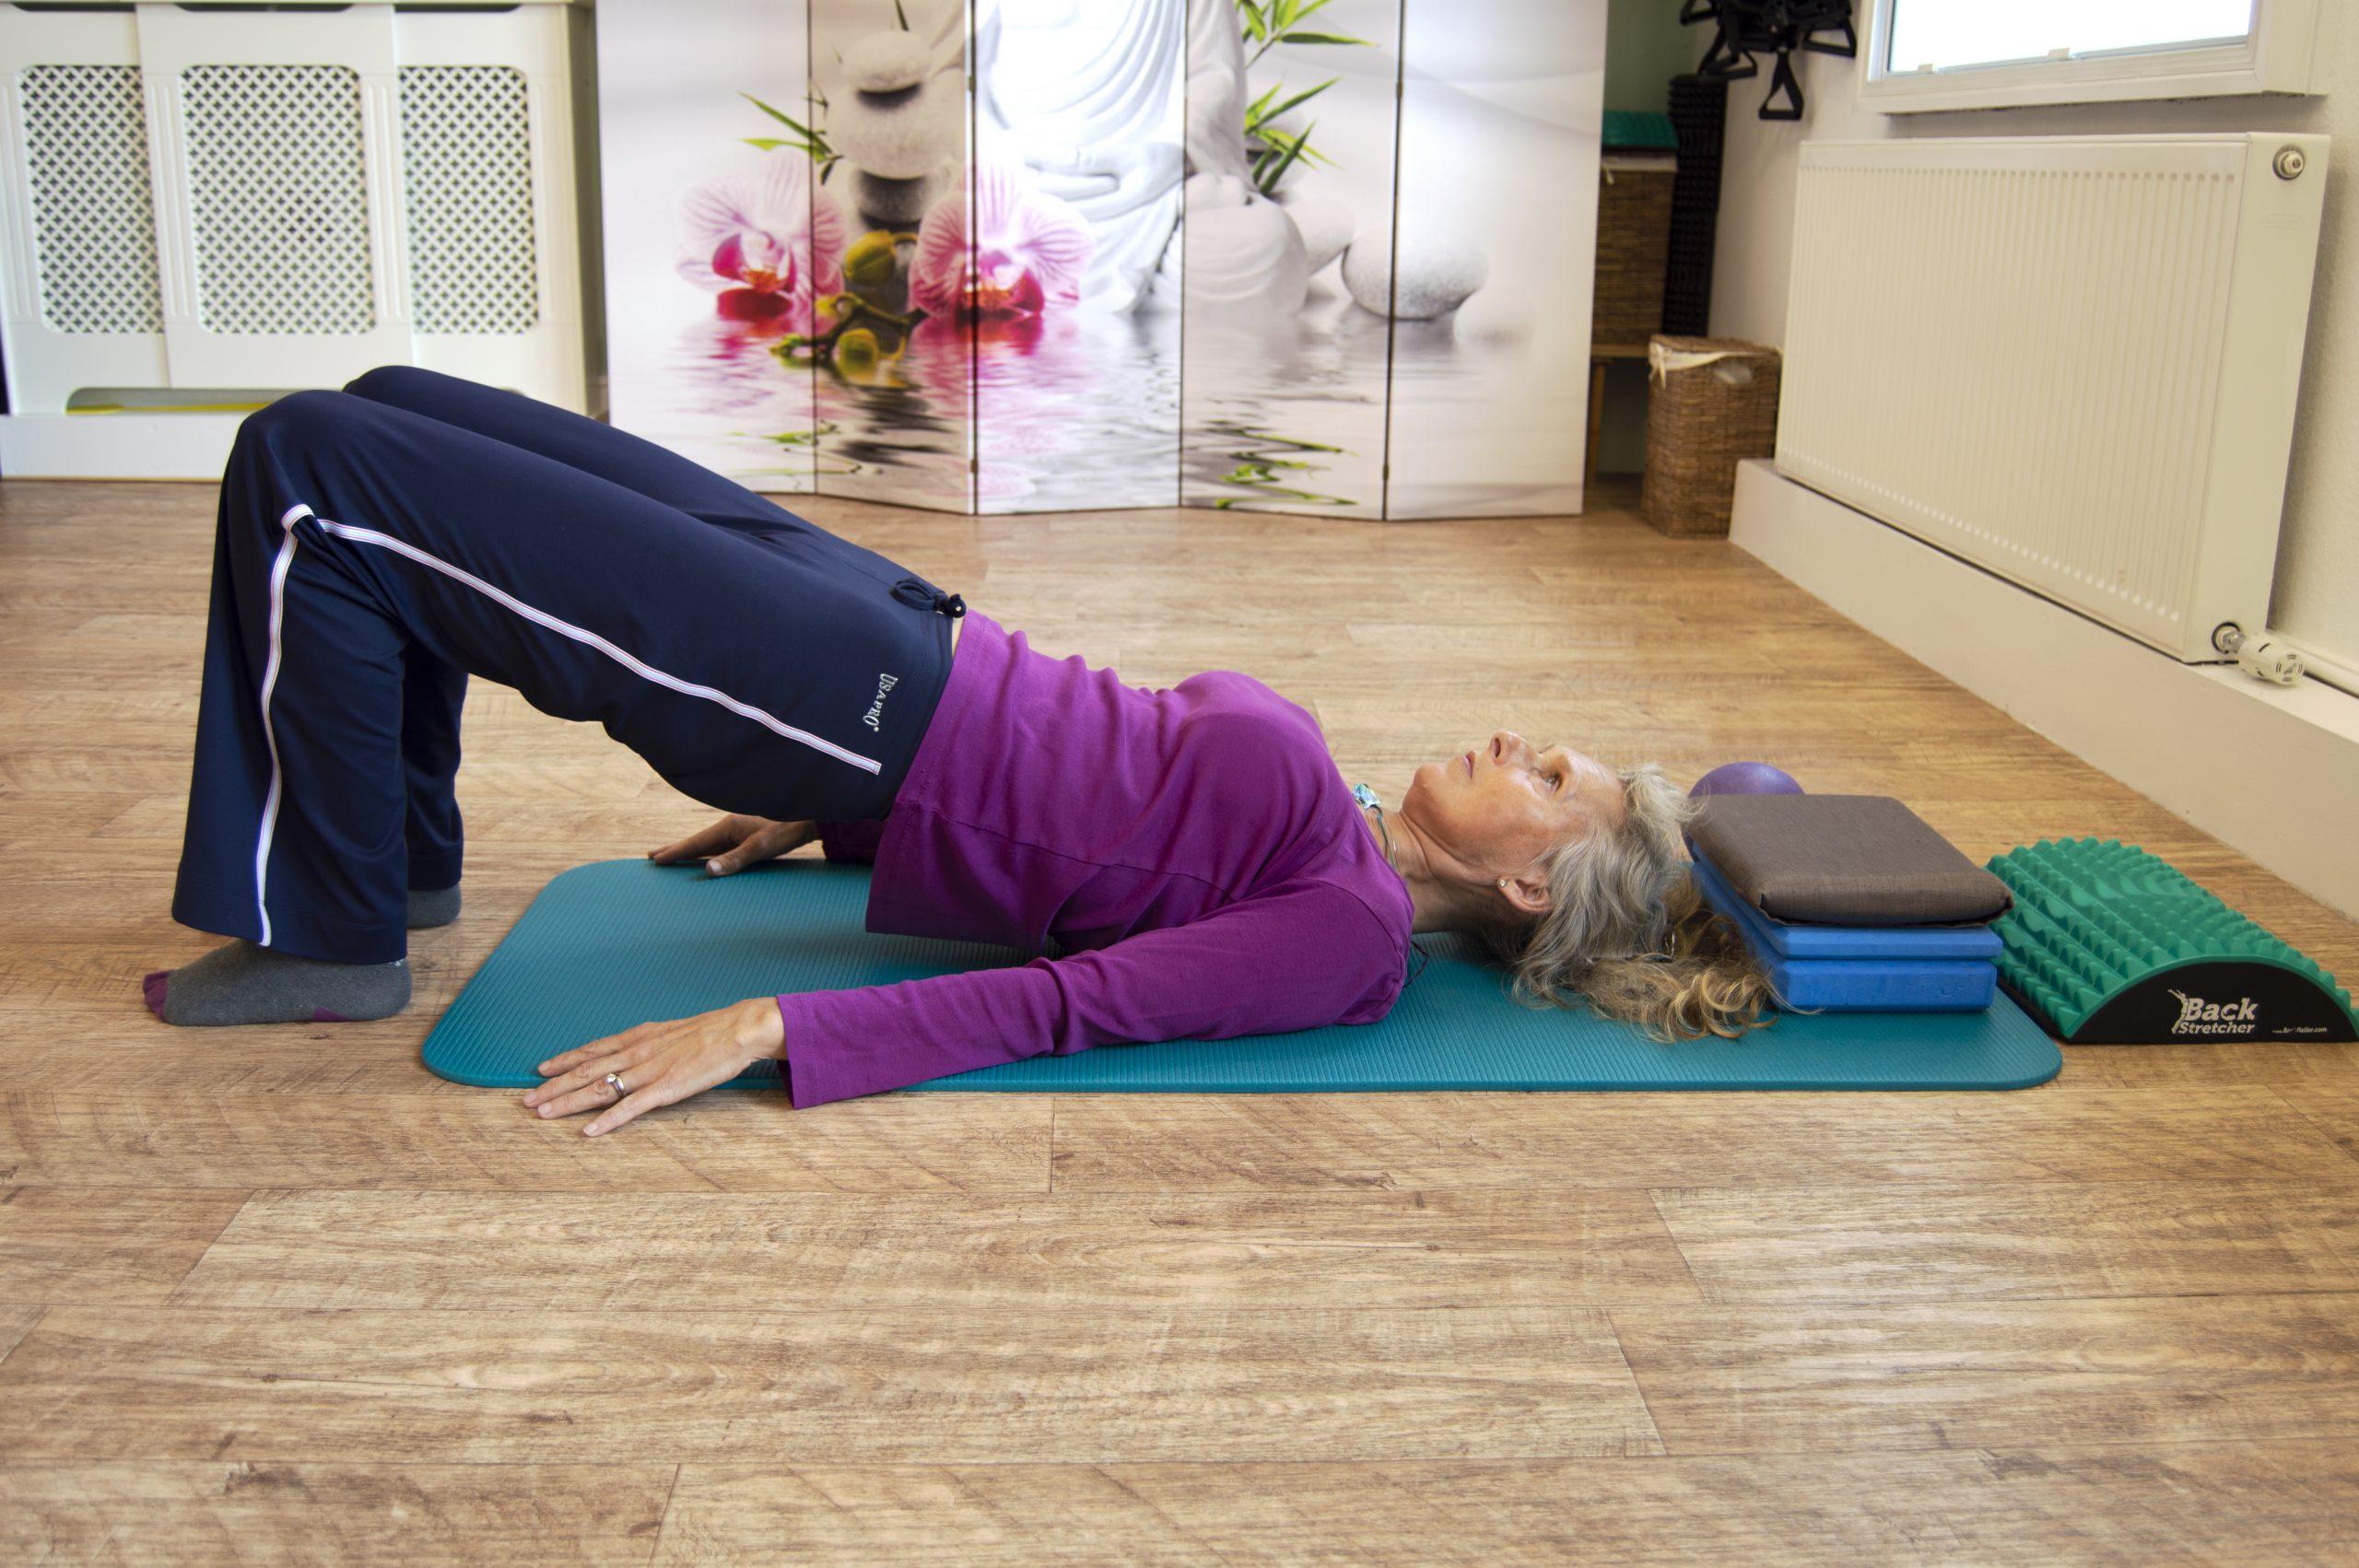 Lying Pilates move